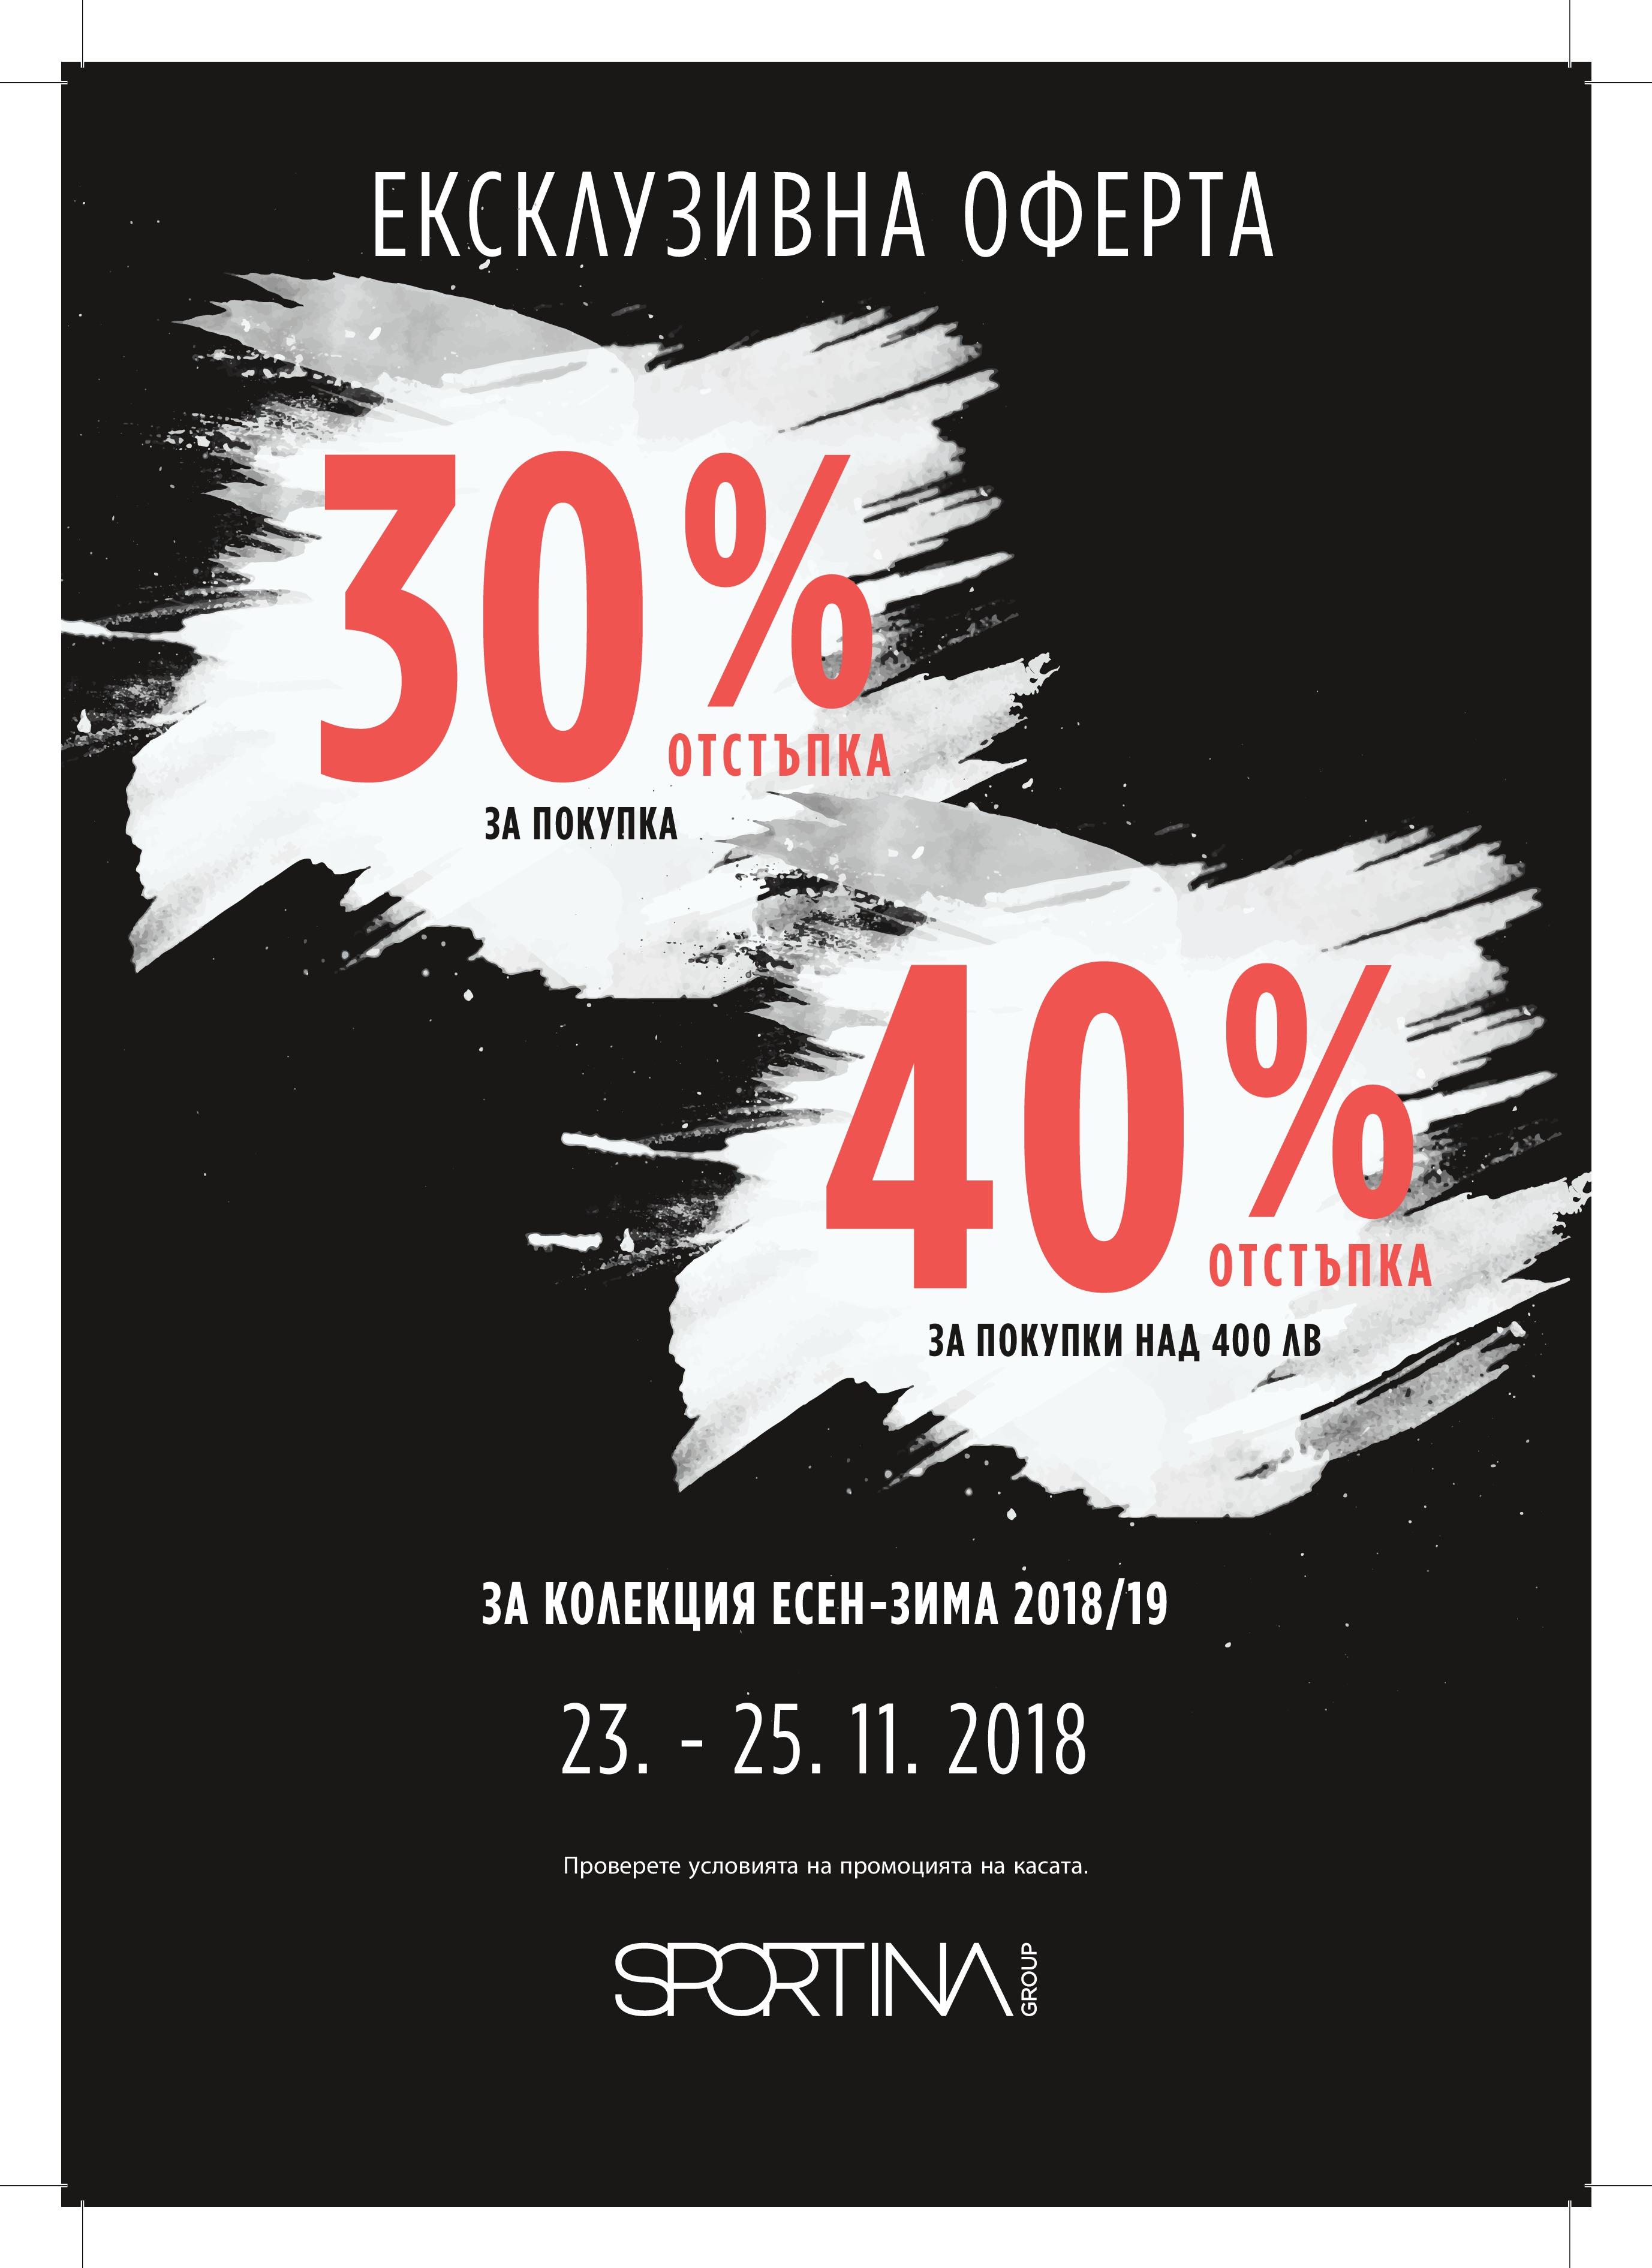 Black weekend at Sportina